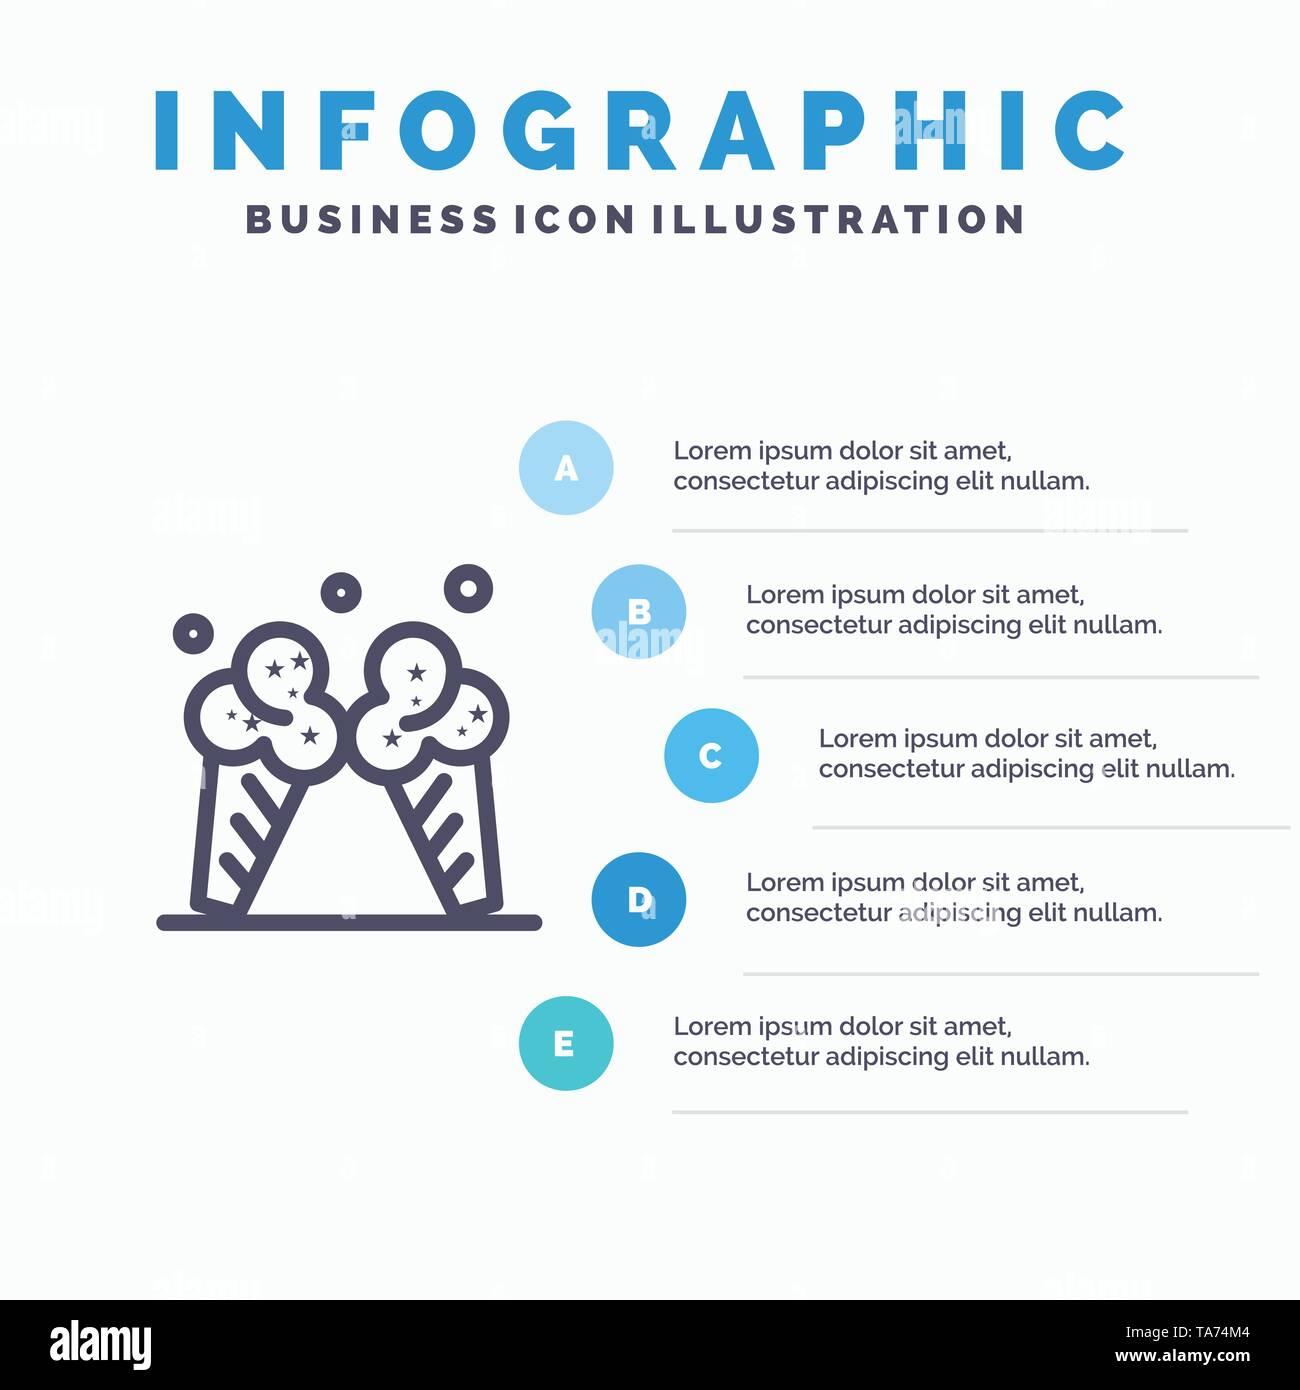 Ice cream, Ice, Cream, American Line icon with 5 steps presentation infographics Background - Stock Image